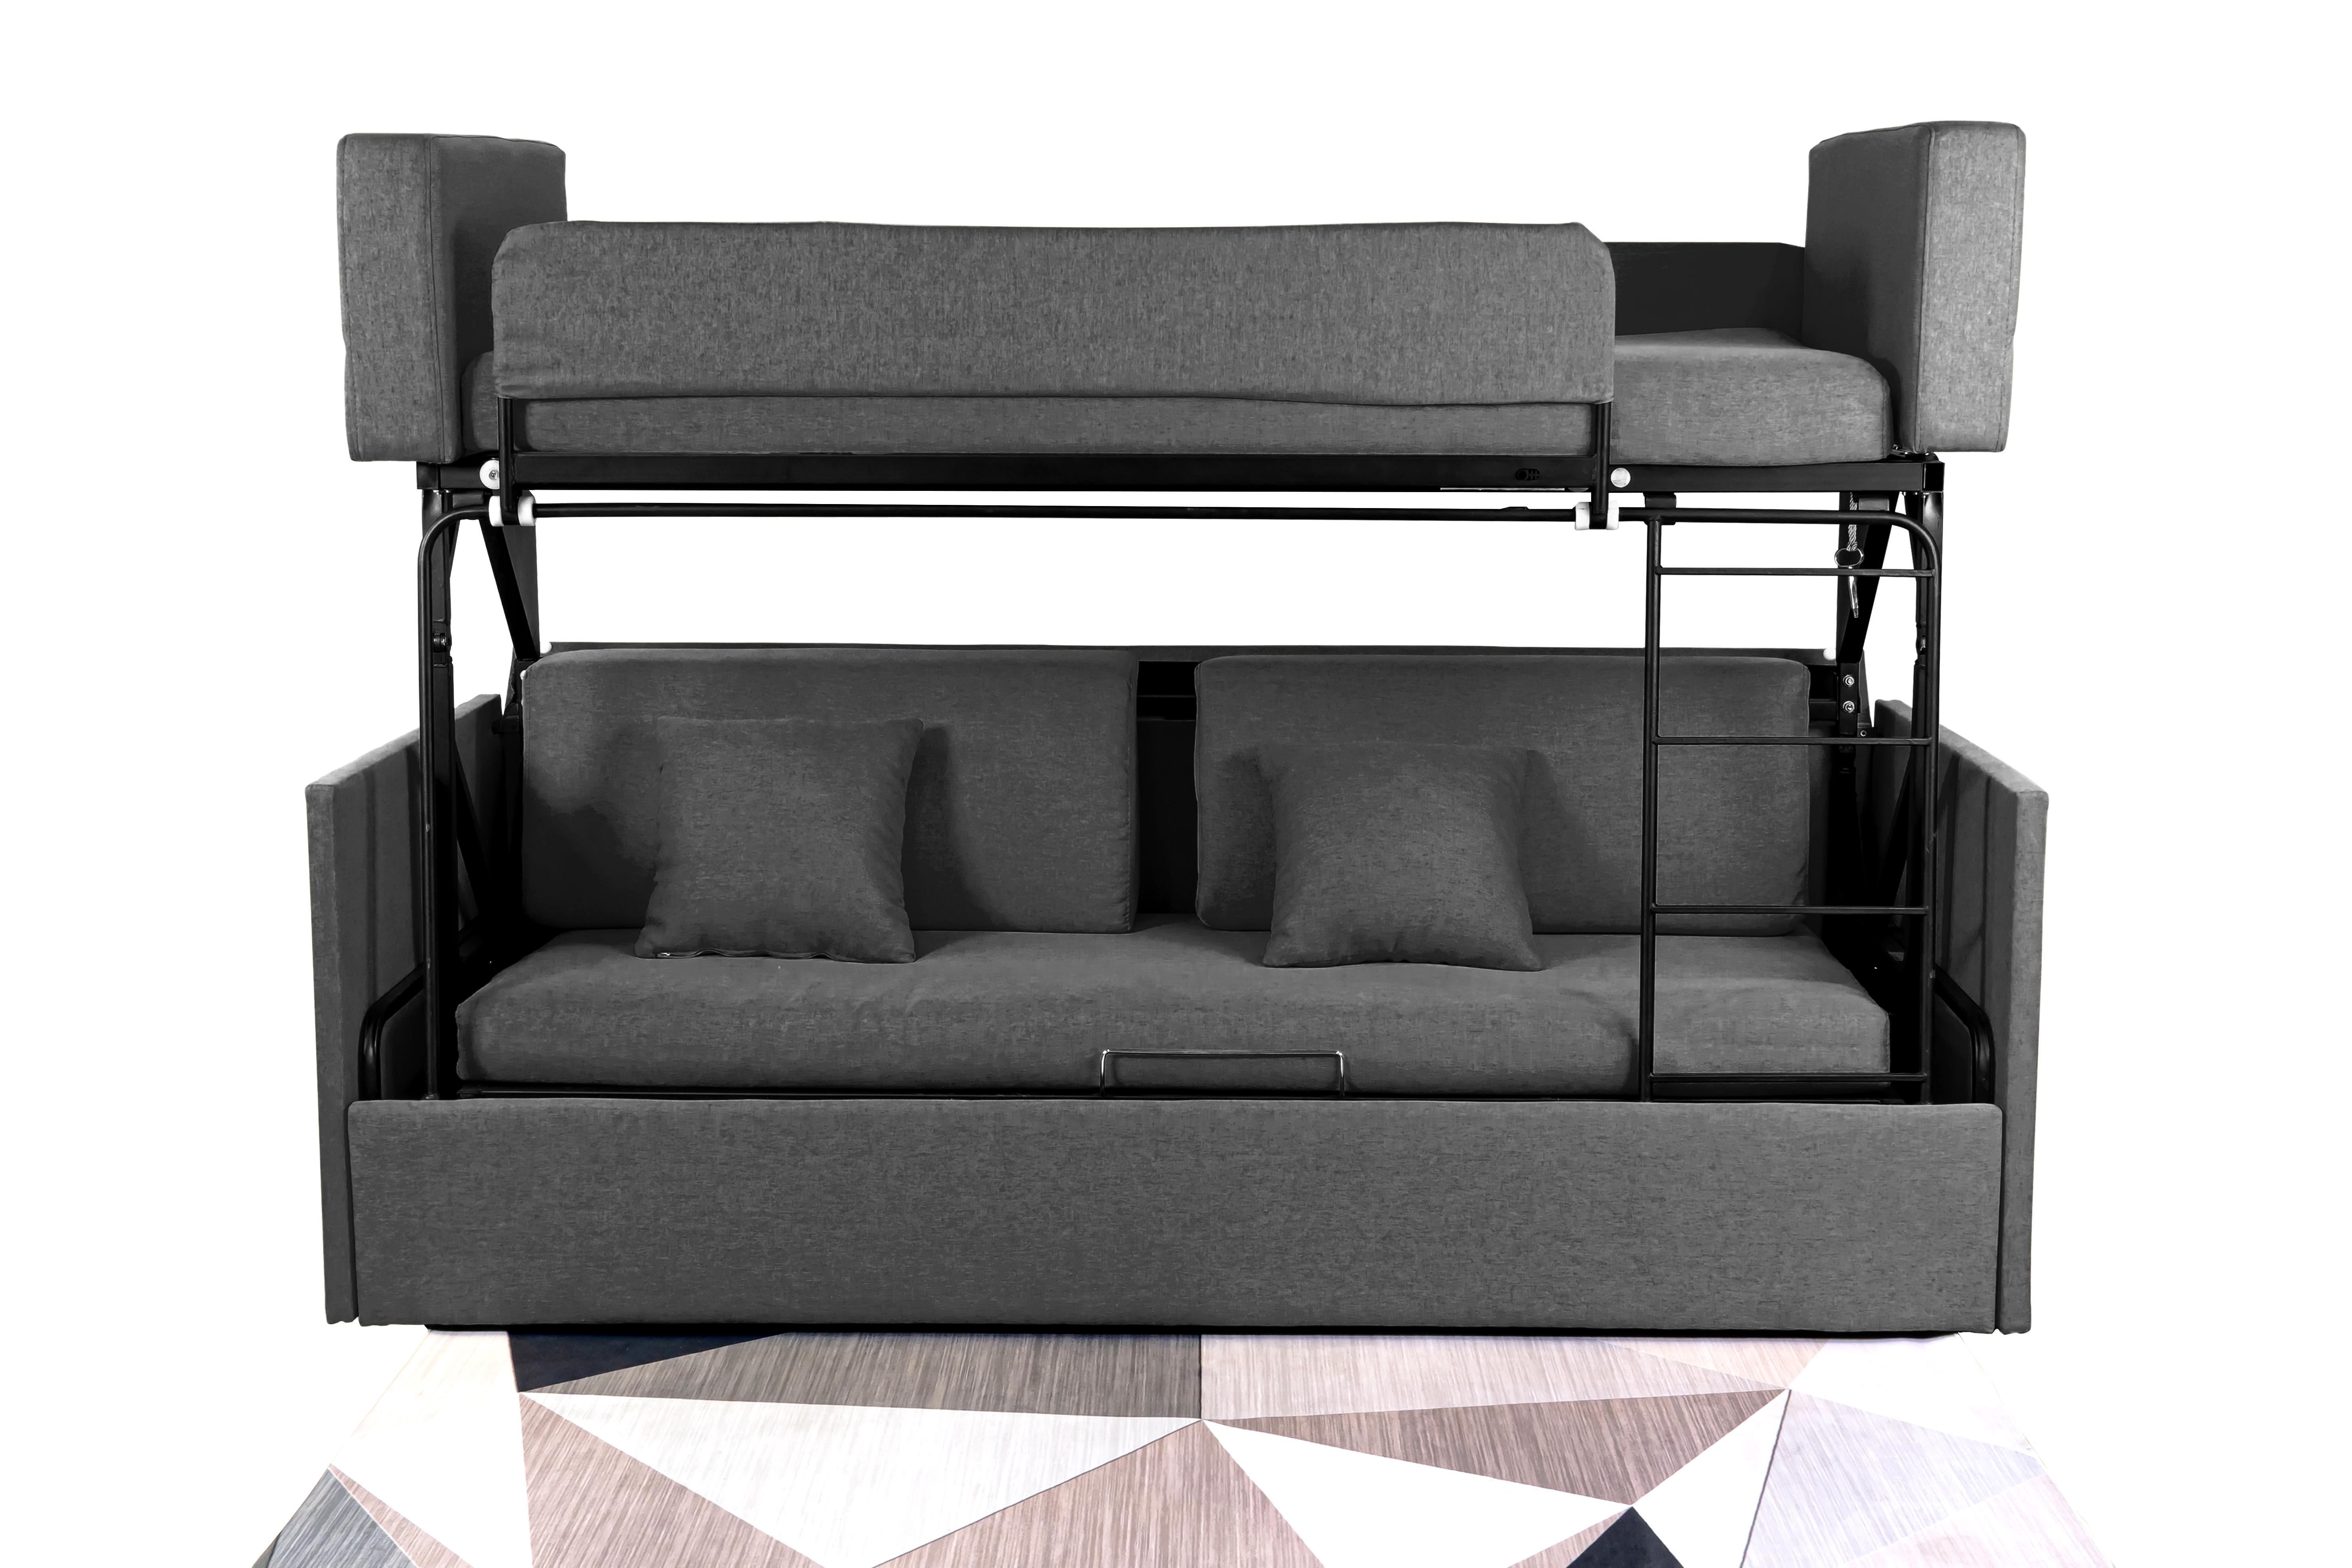 Sofabed โซฟาเตียง 2 ชั้น ผ้าลิ